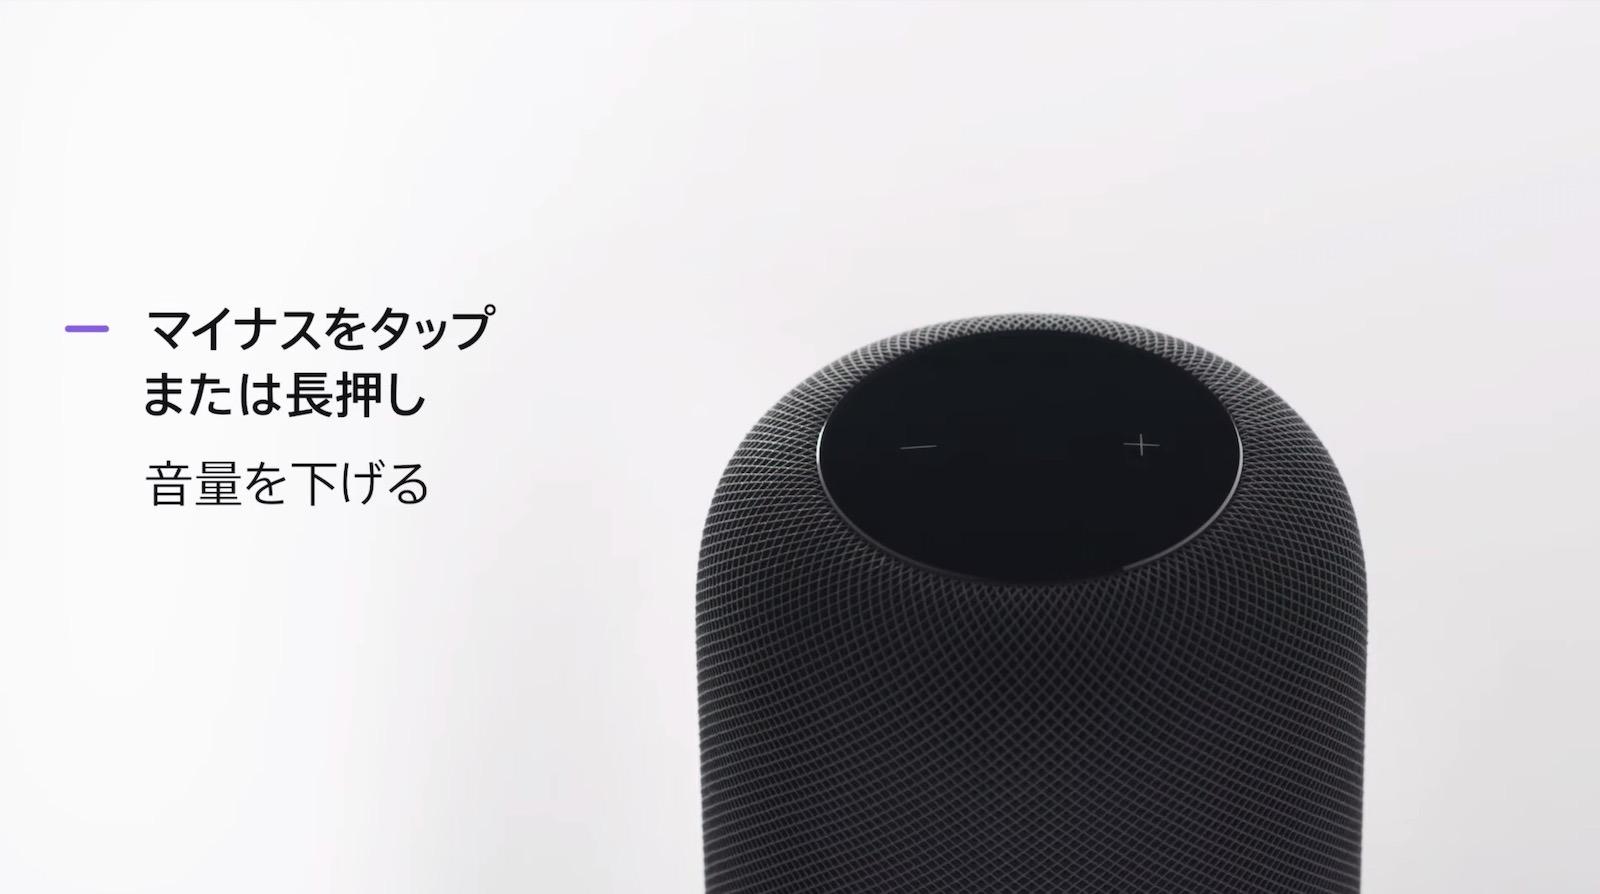 HomePod上部「ー」ボタンをタップまたは長押し:音量を下げる